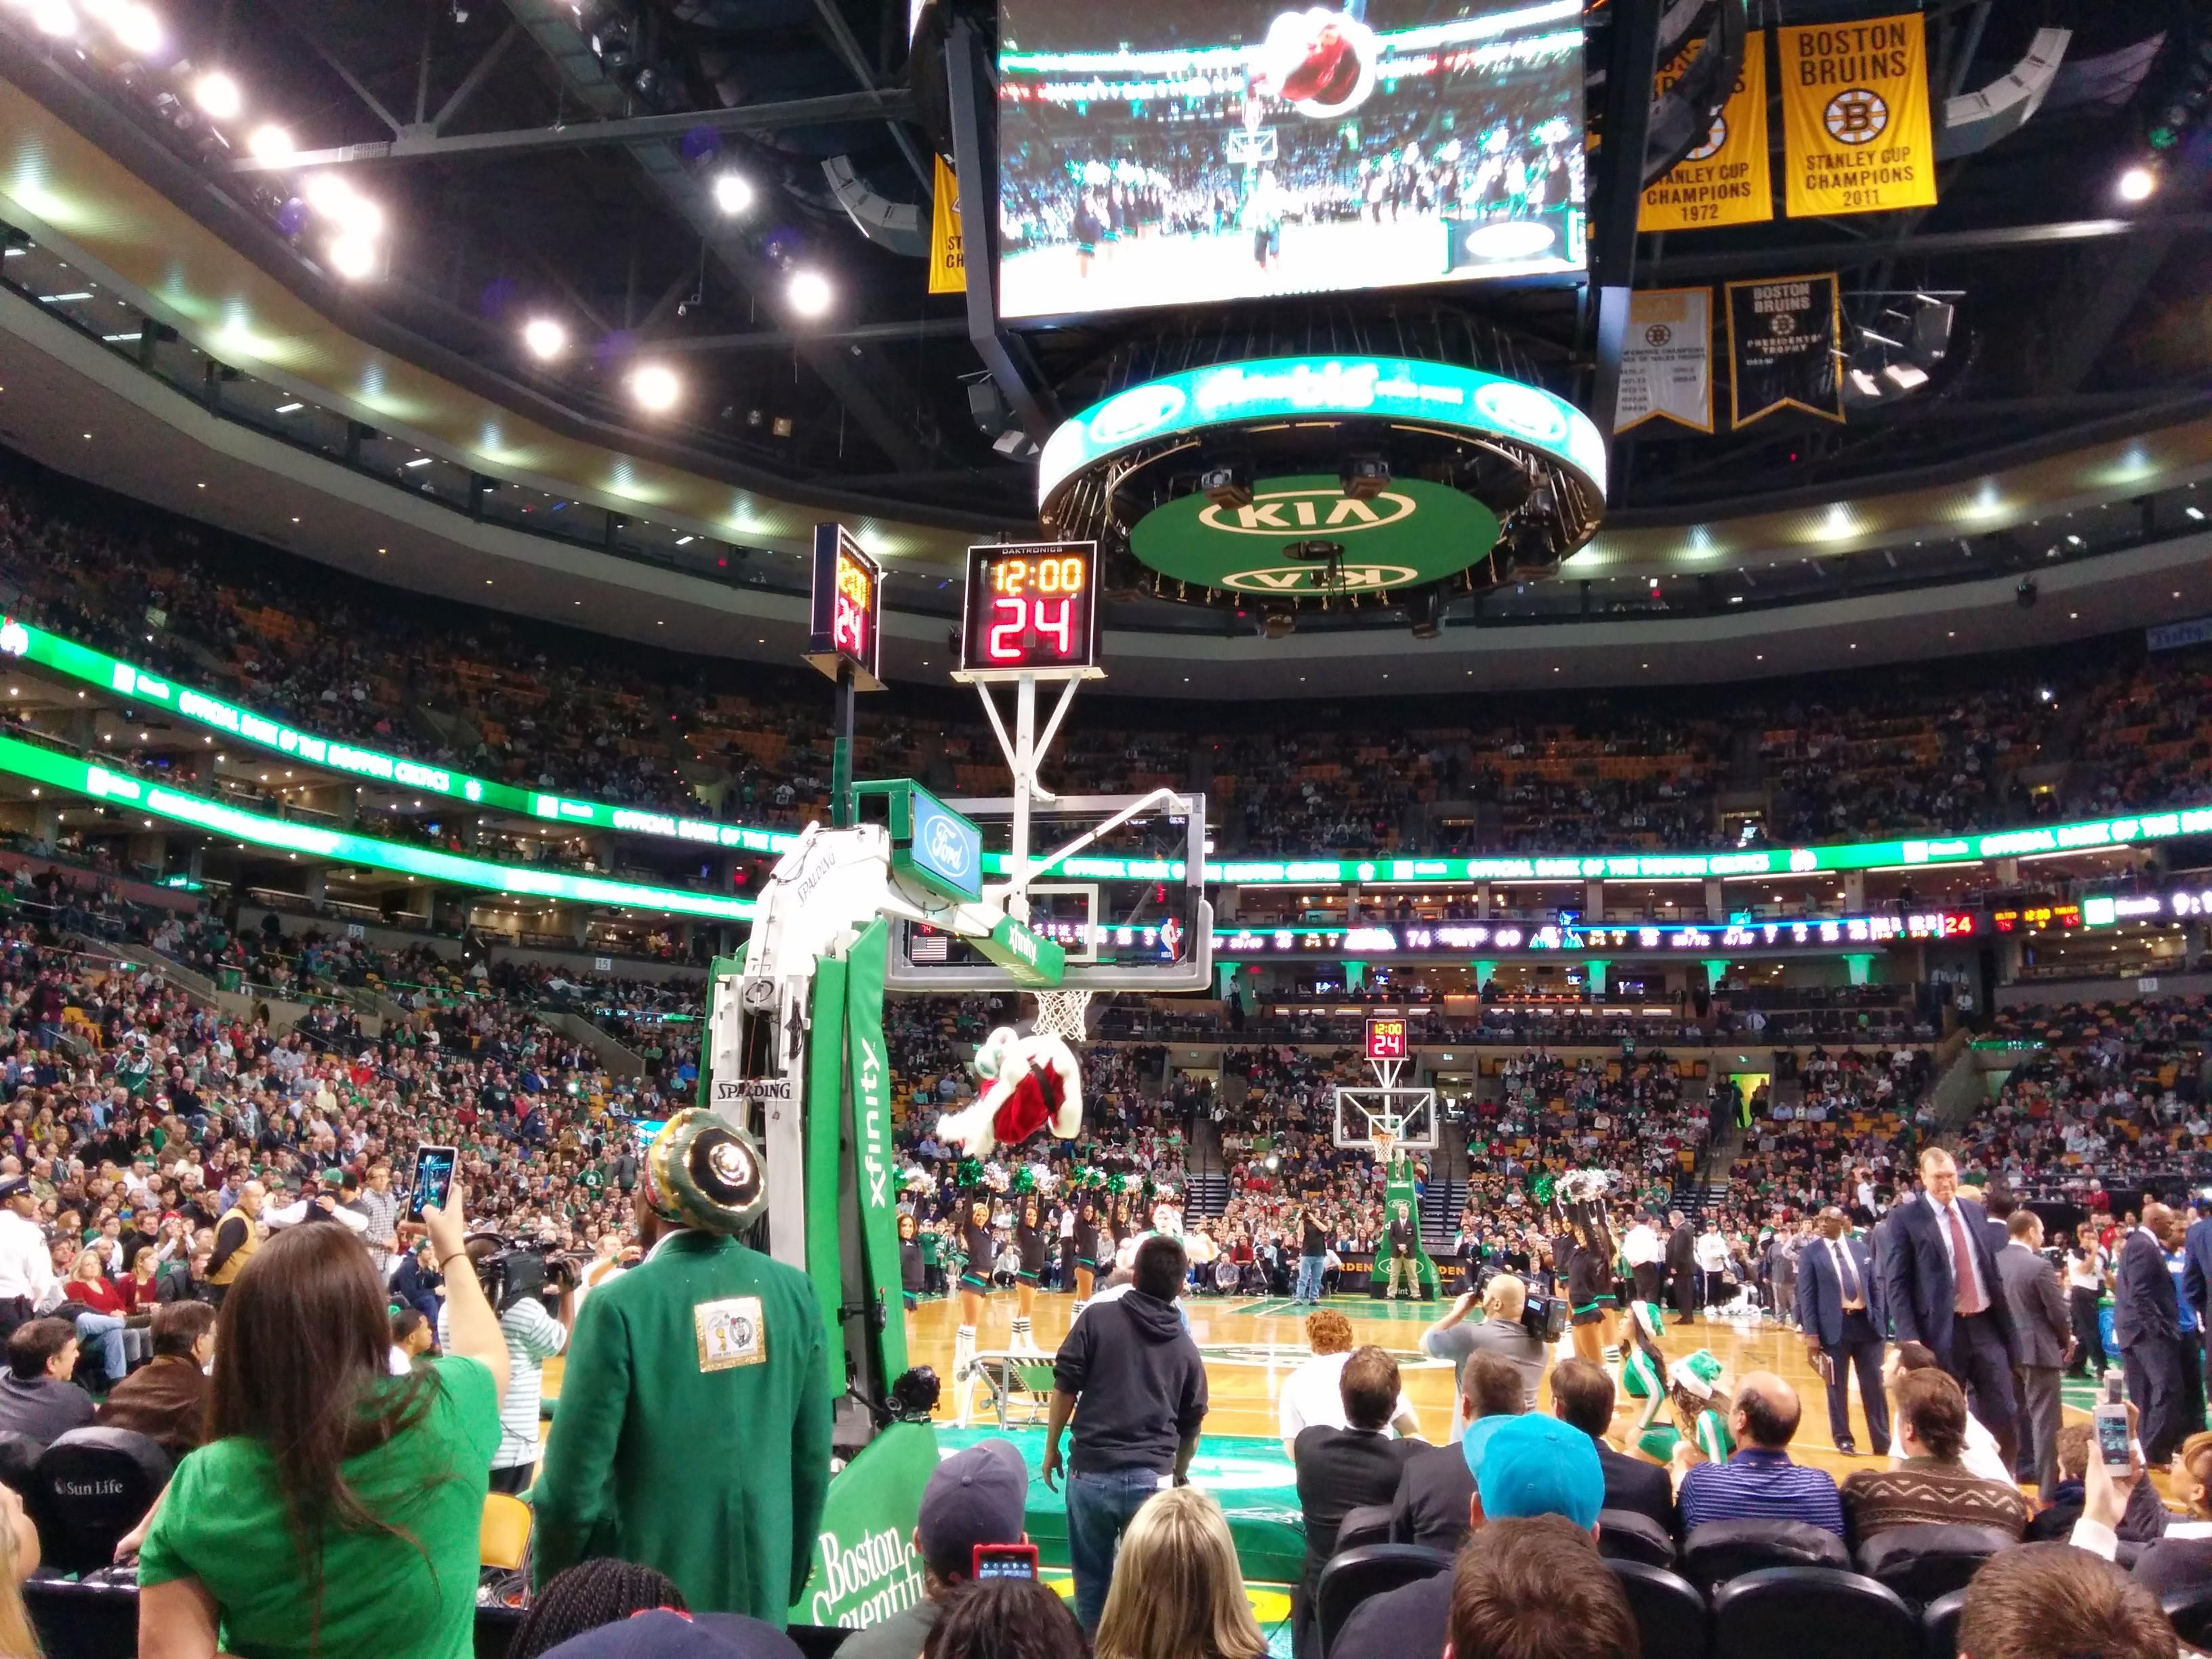 Td Garden Section Loge 6 Row E Seat 7 Boston Celtics Vs